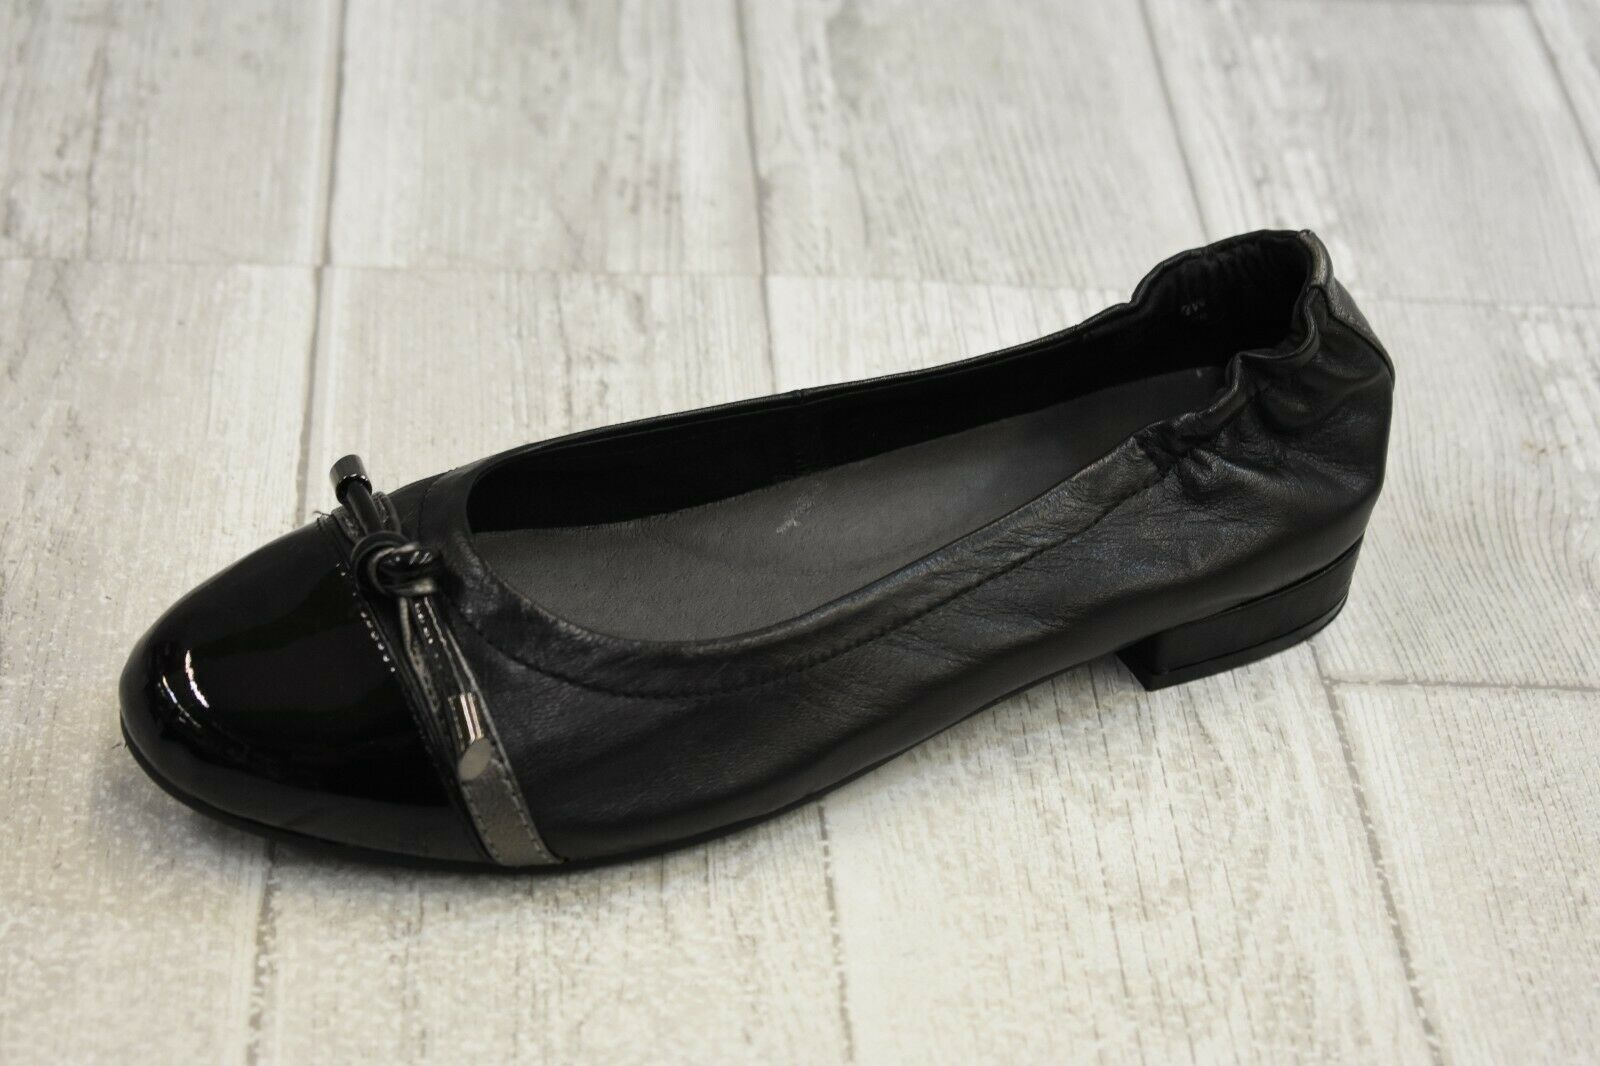 David Tate Amelia Cap Toe Leather Flats, Wouomo Dimensione 8W, nero NEW